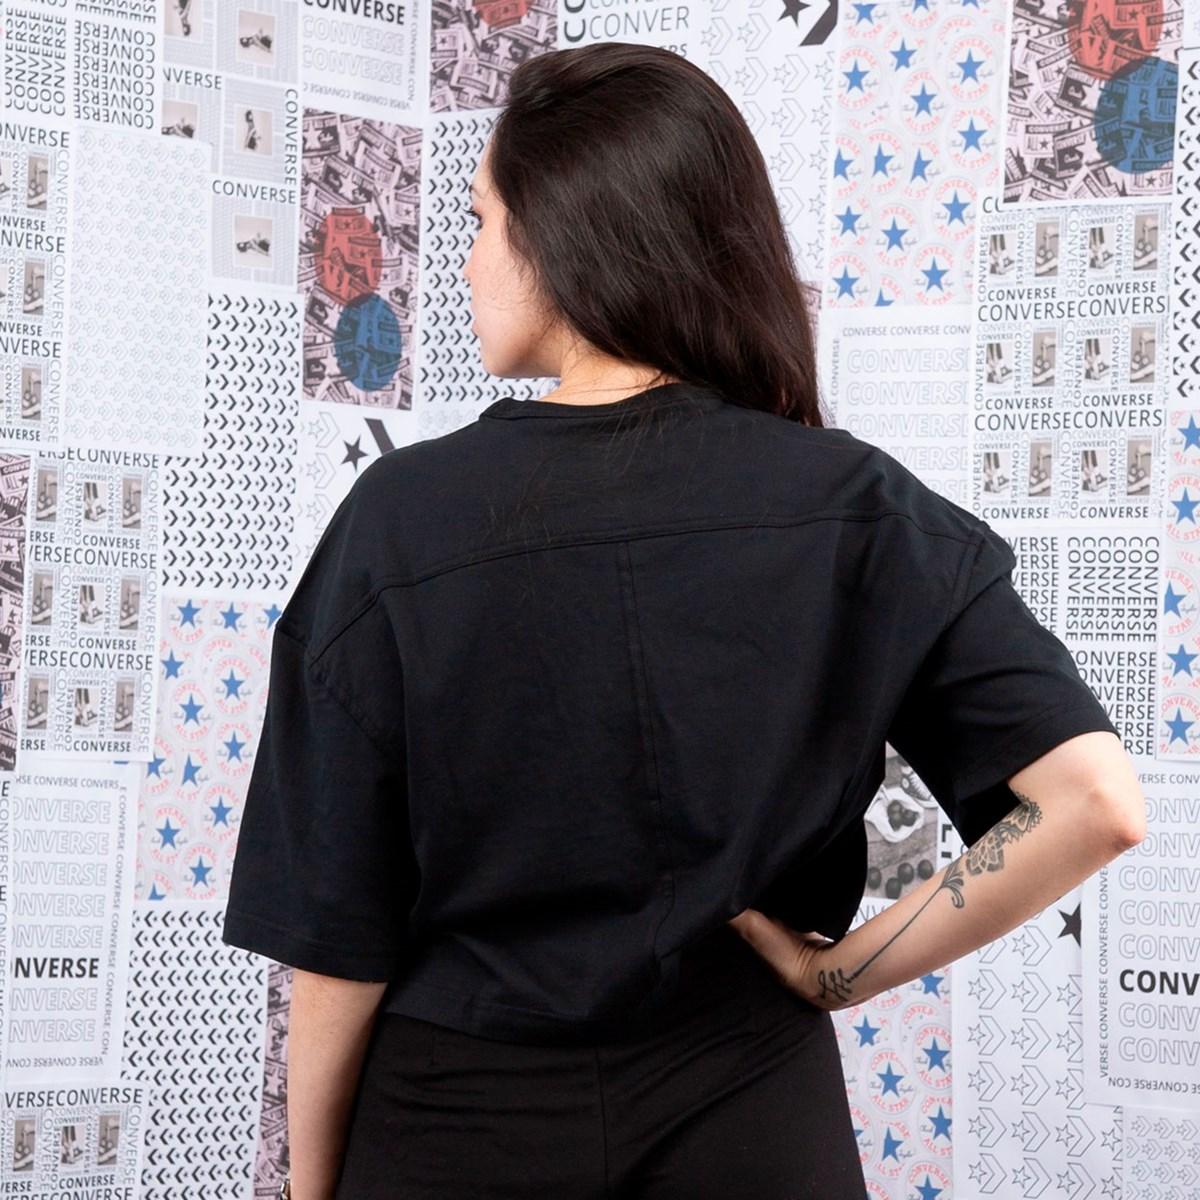 Camiseta Converse Cropped Chuck 70s Cut & Sew Black 10020757-A02